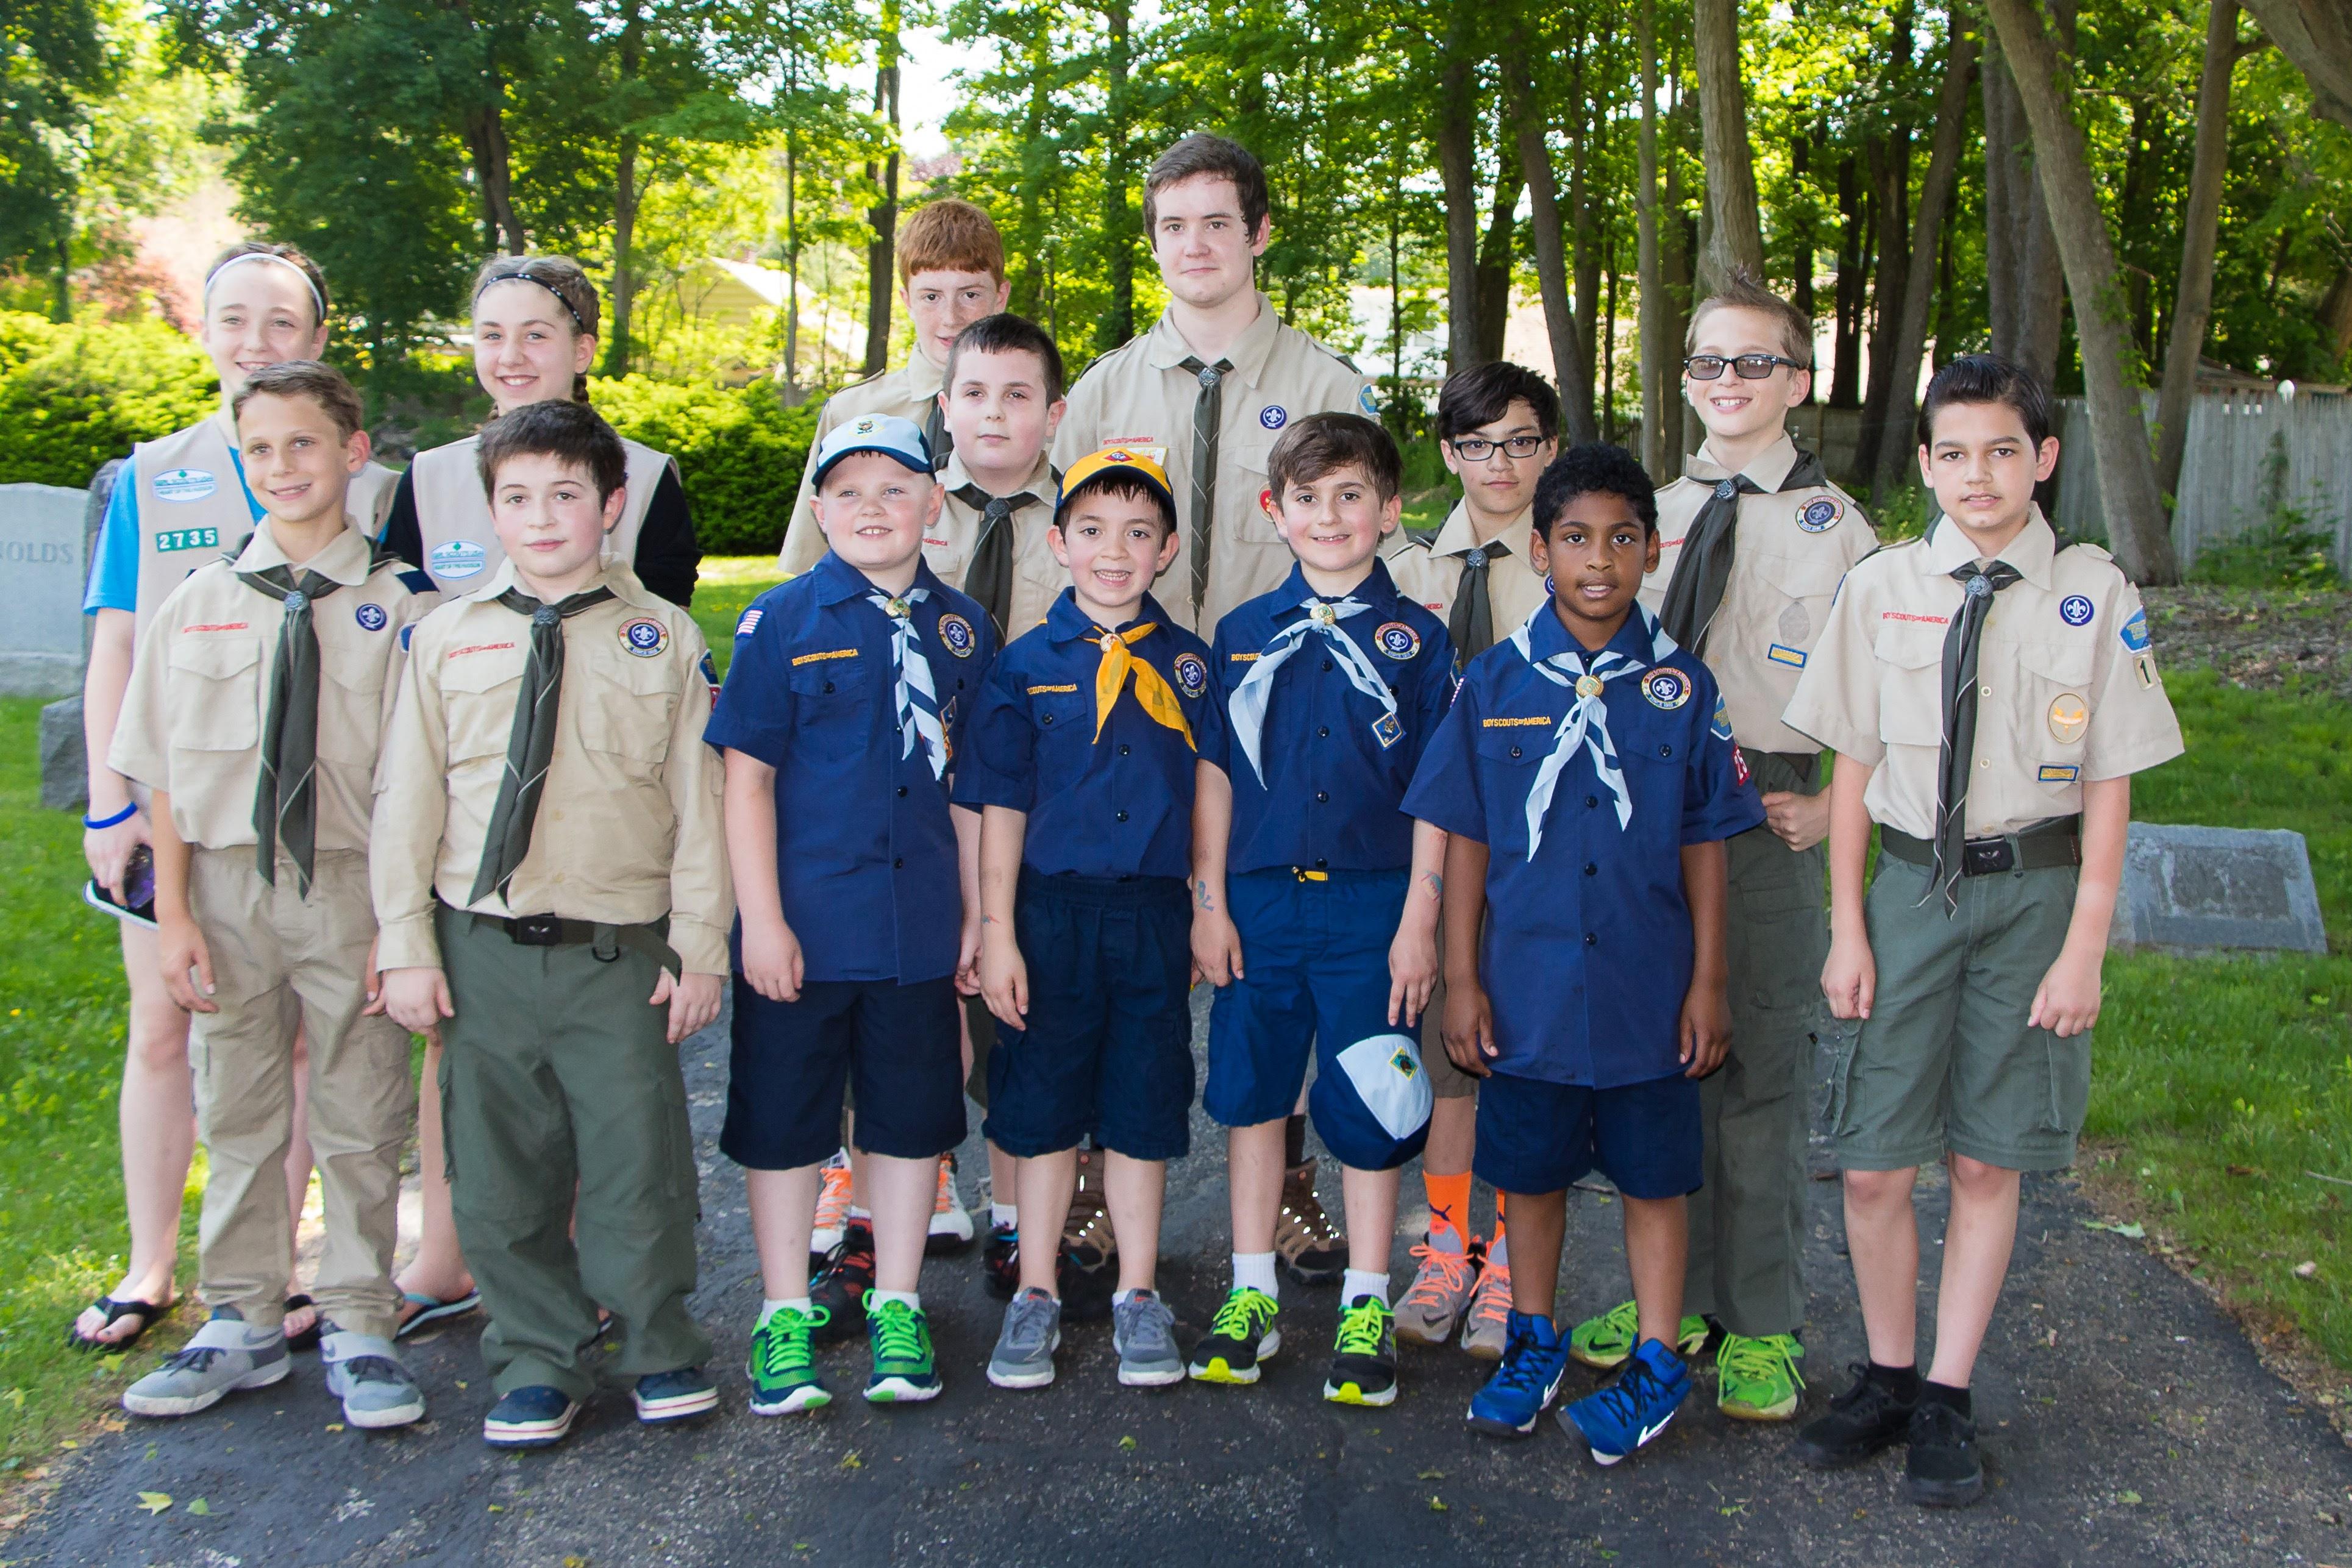 66547a55305d211cc4ce_20160528_Boy_Scouts_Memorial_Day_Flag_Settng_114.jpg